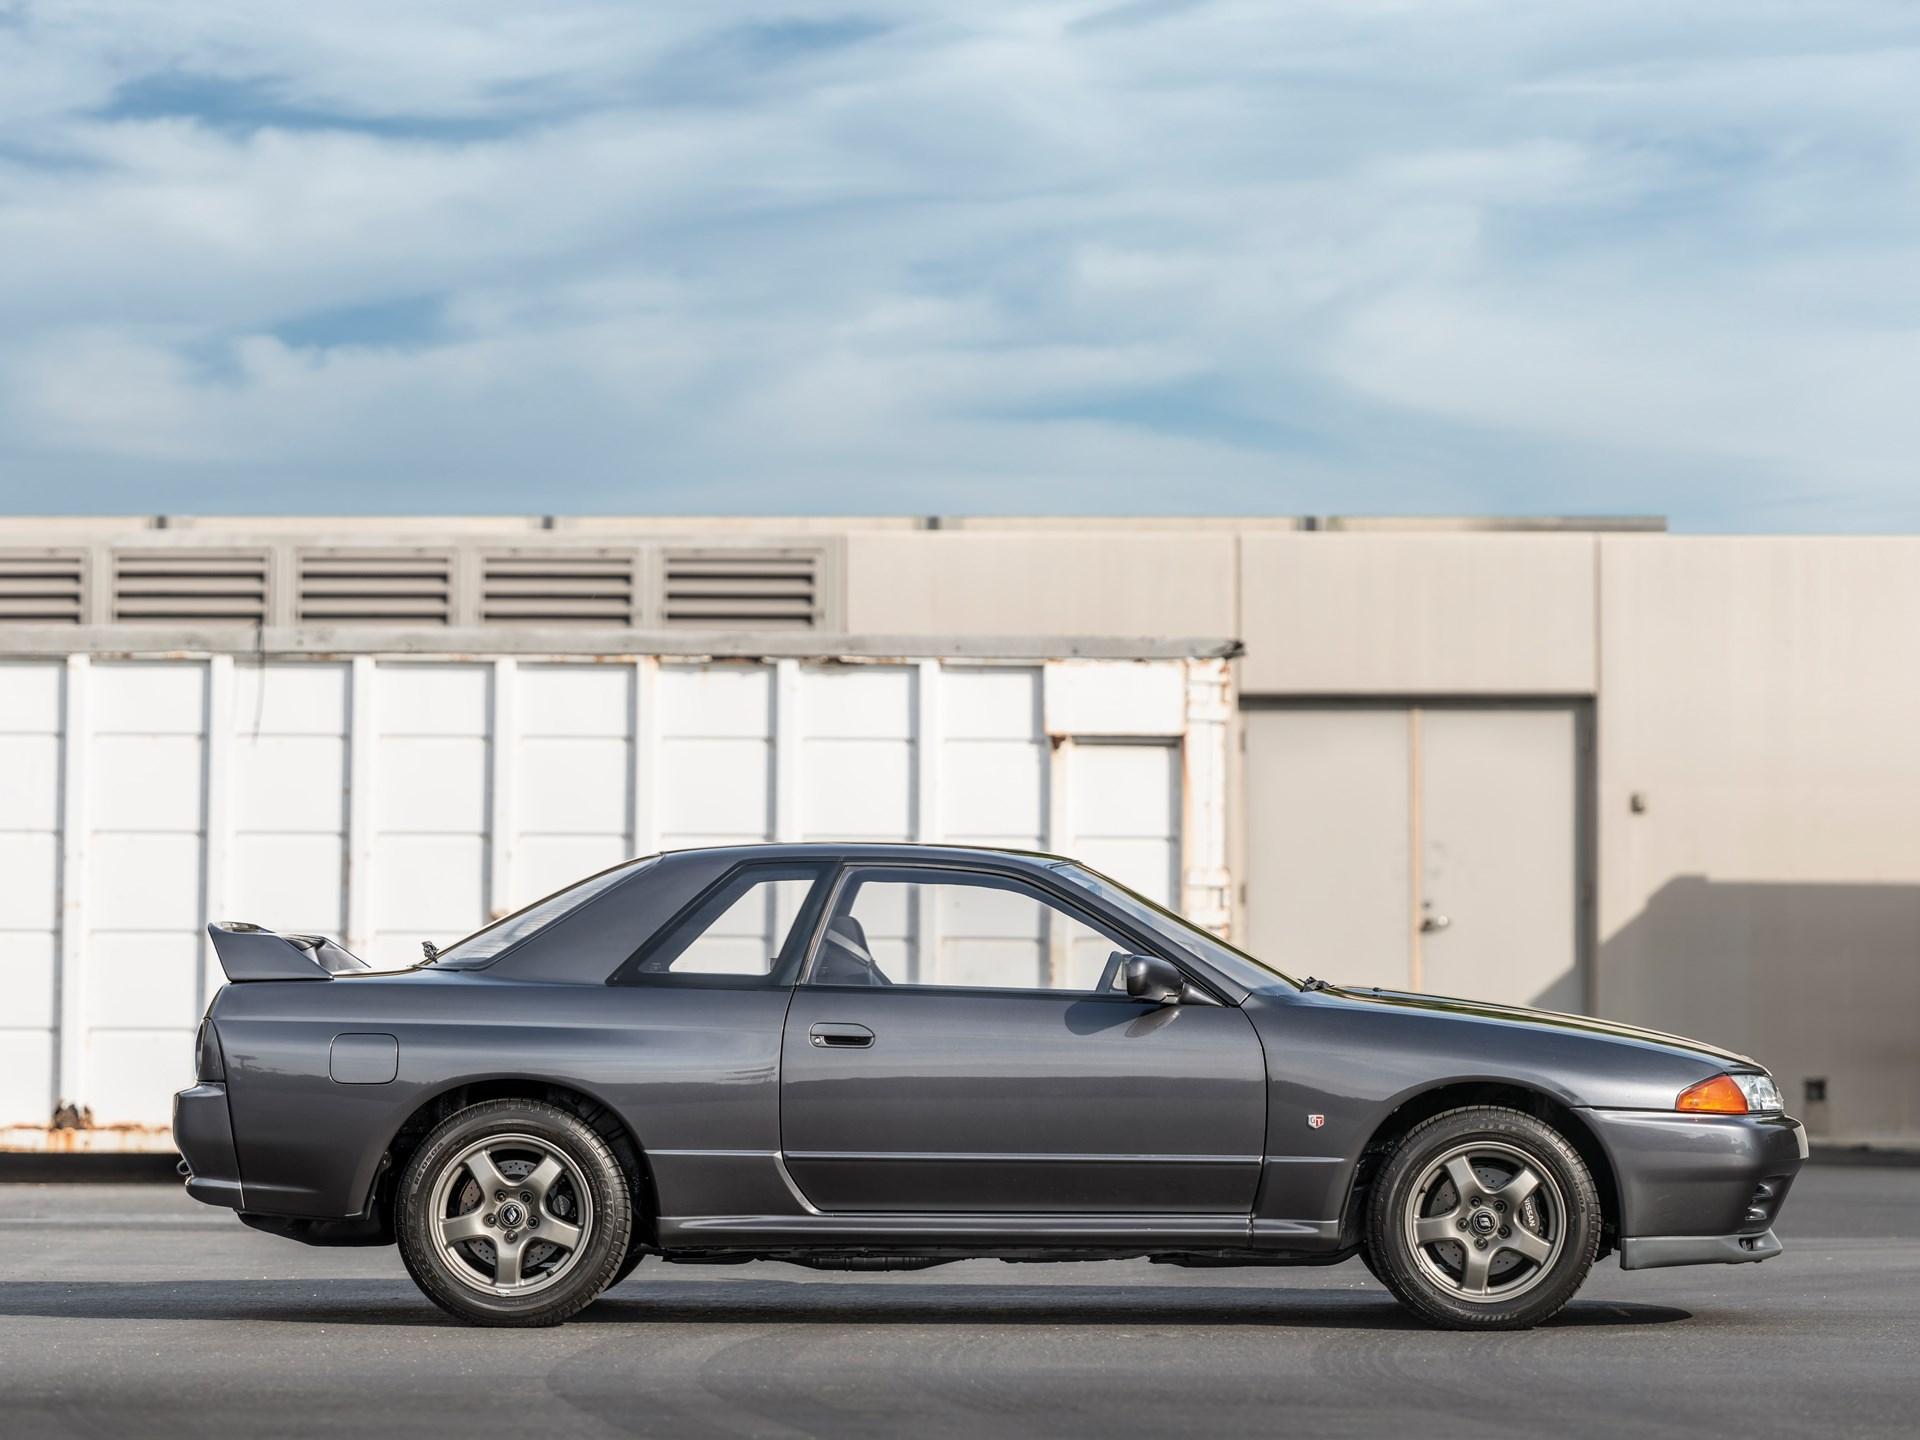 1989 Nissan GTR